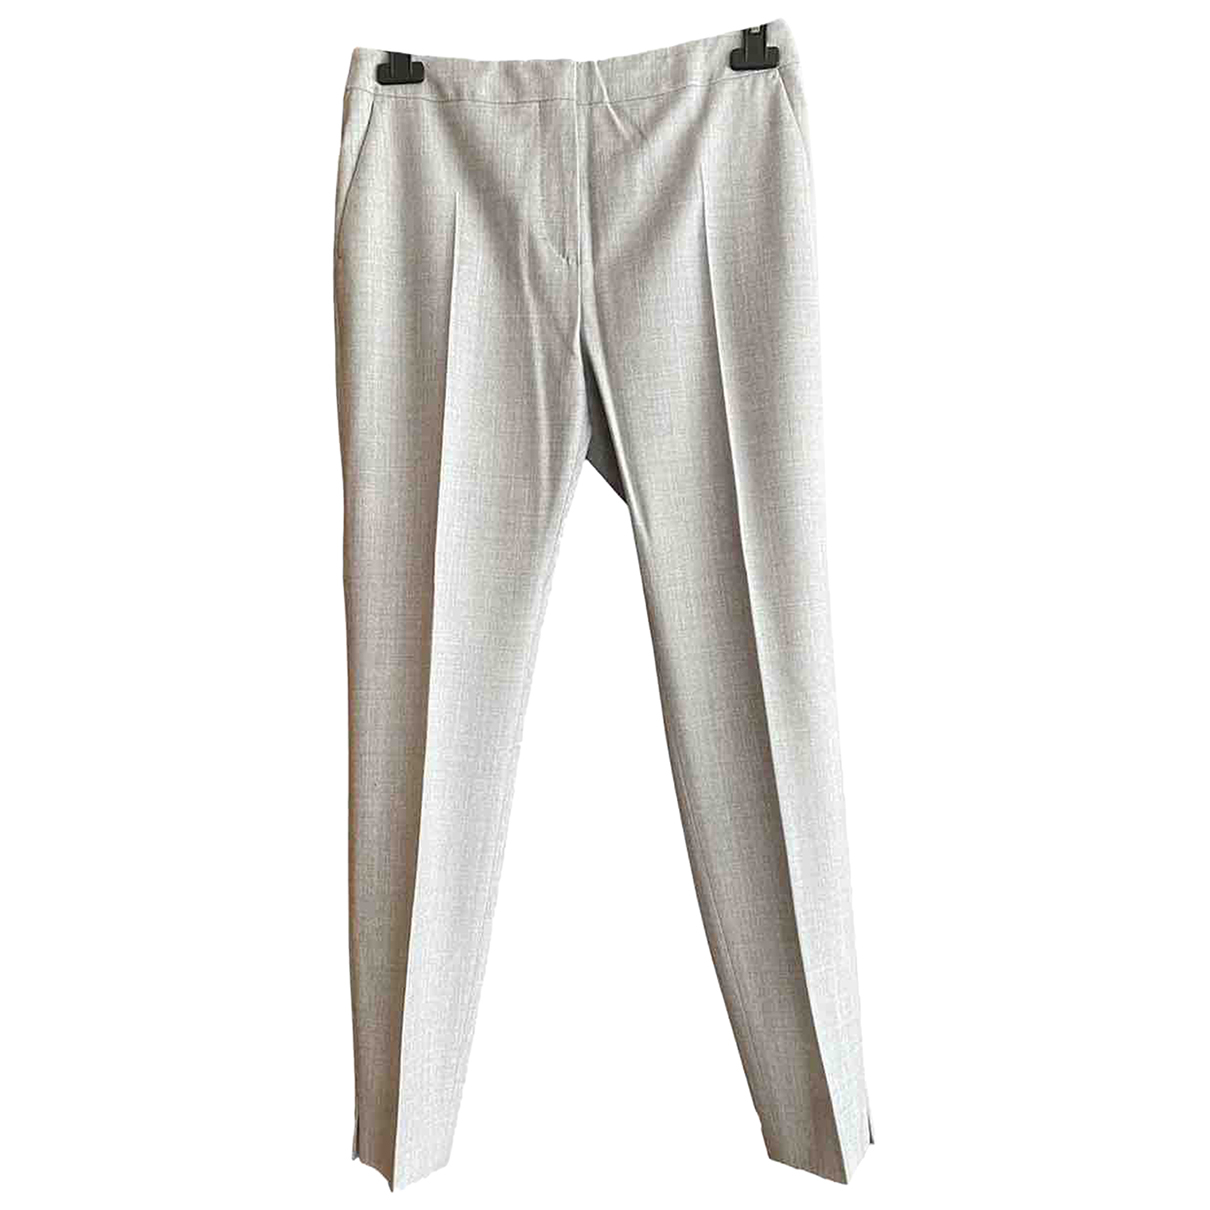 Max Mara N Grey Wool Trousers for Women 38 IT